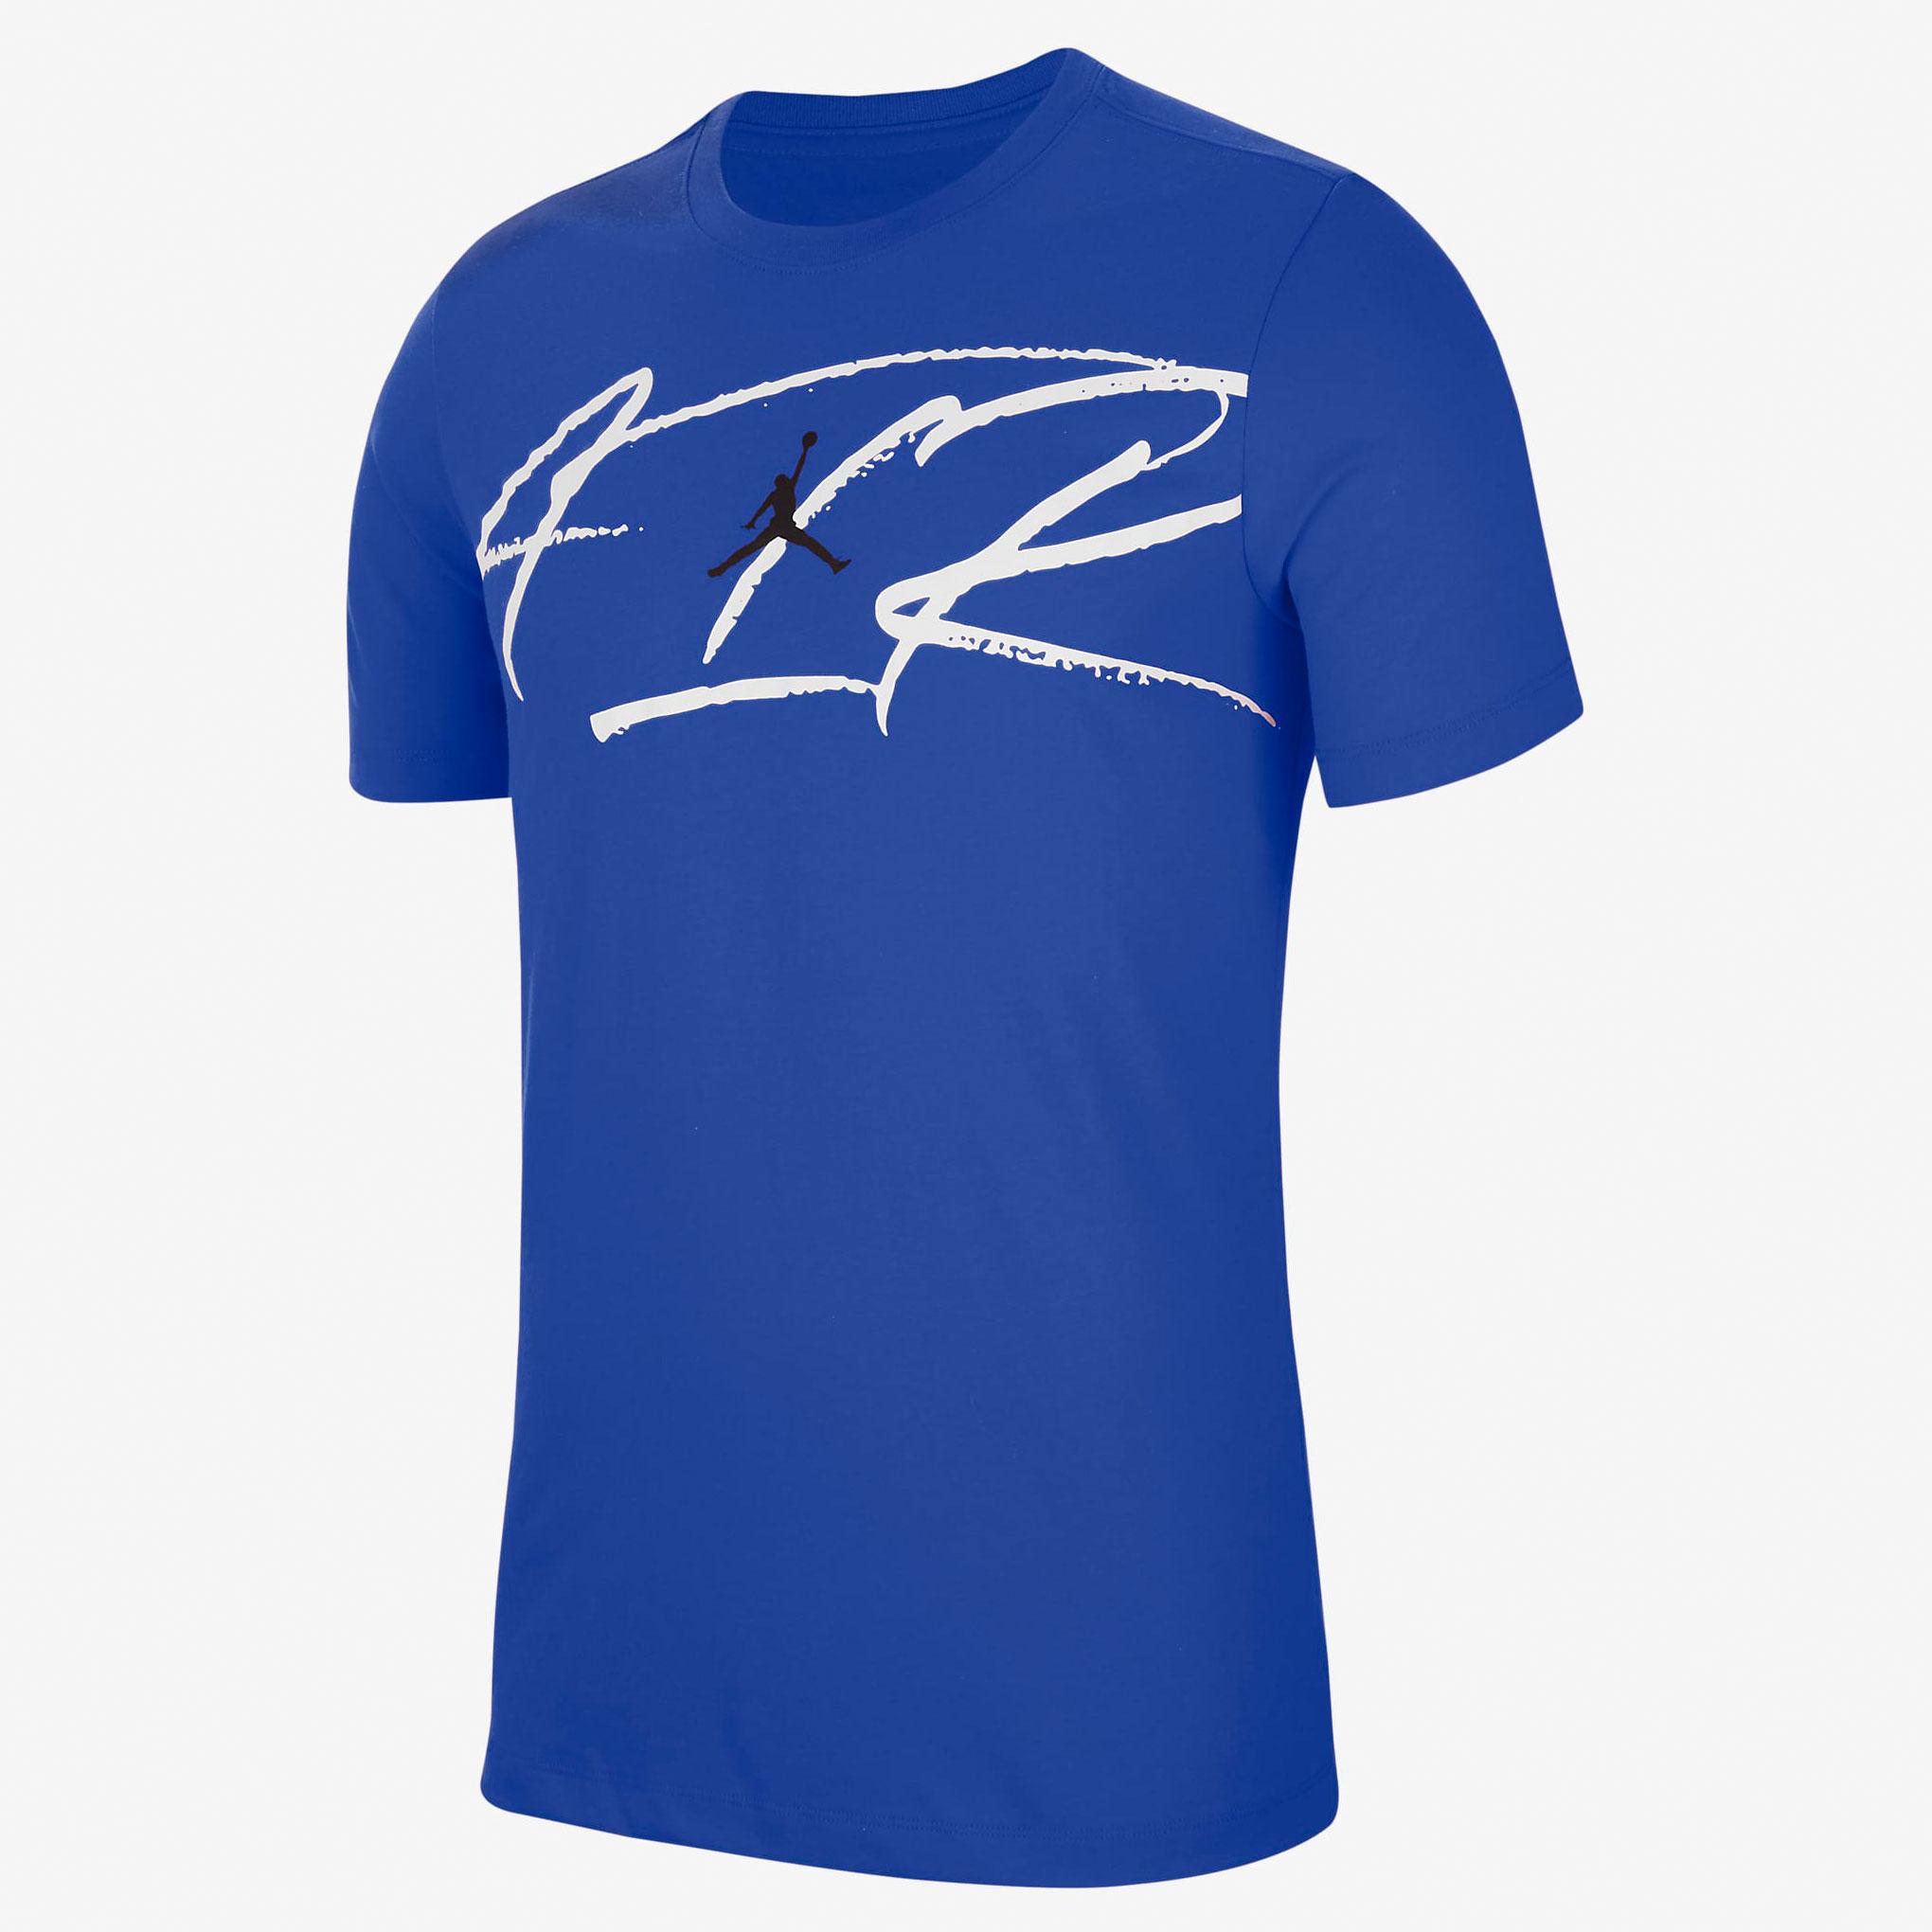 air-jordan-1-flyease-hyper-royal-shirt